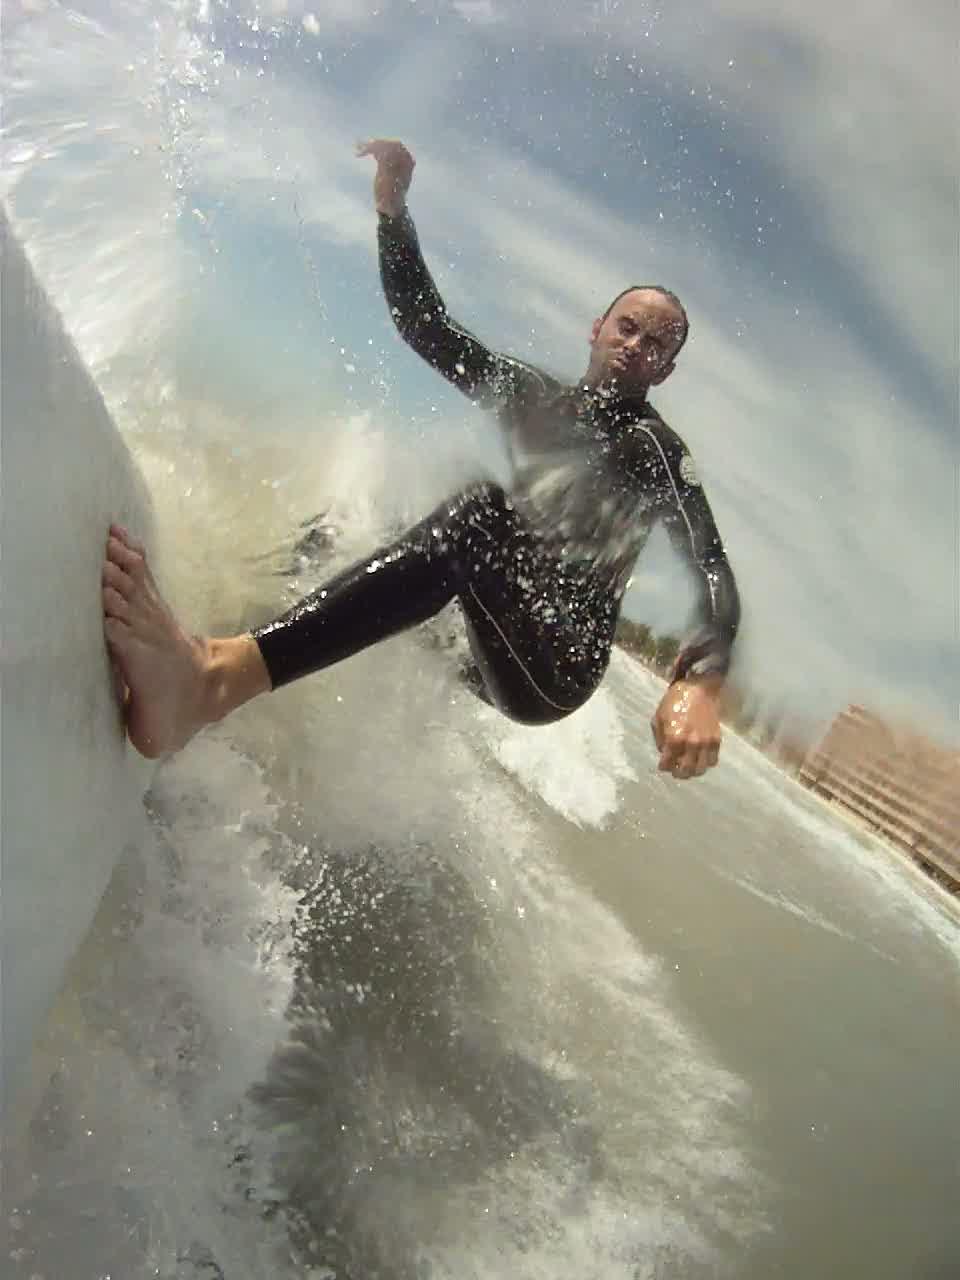 GoPro goes surfing Creative Commons License courtesy Gordon Tarpley